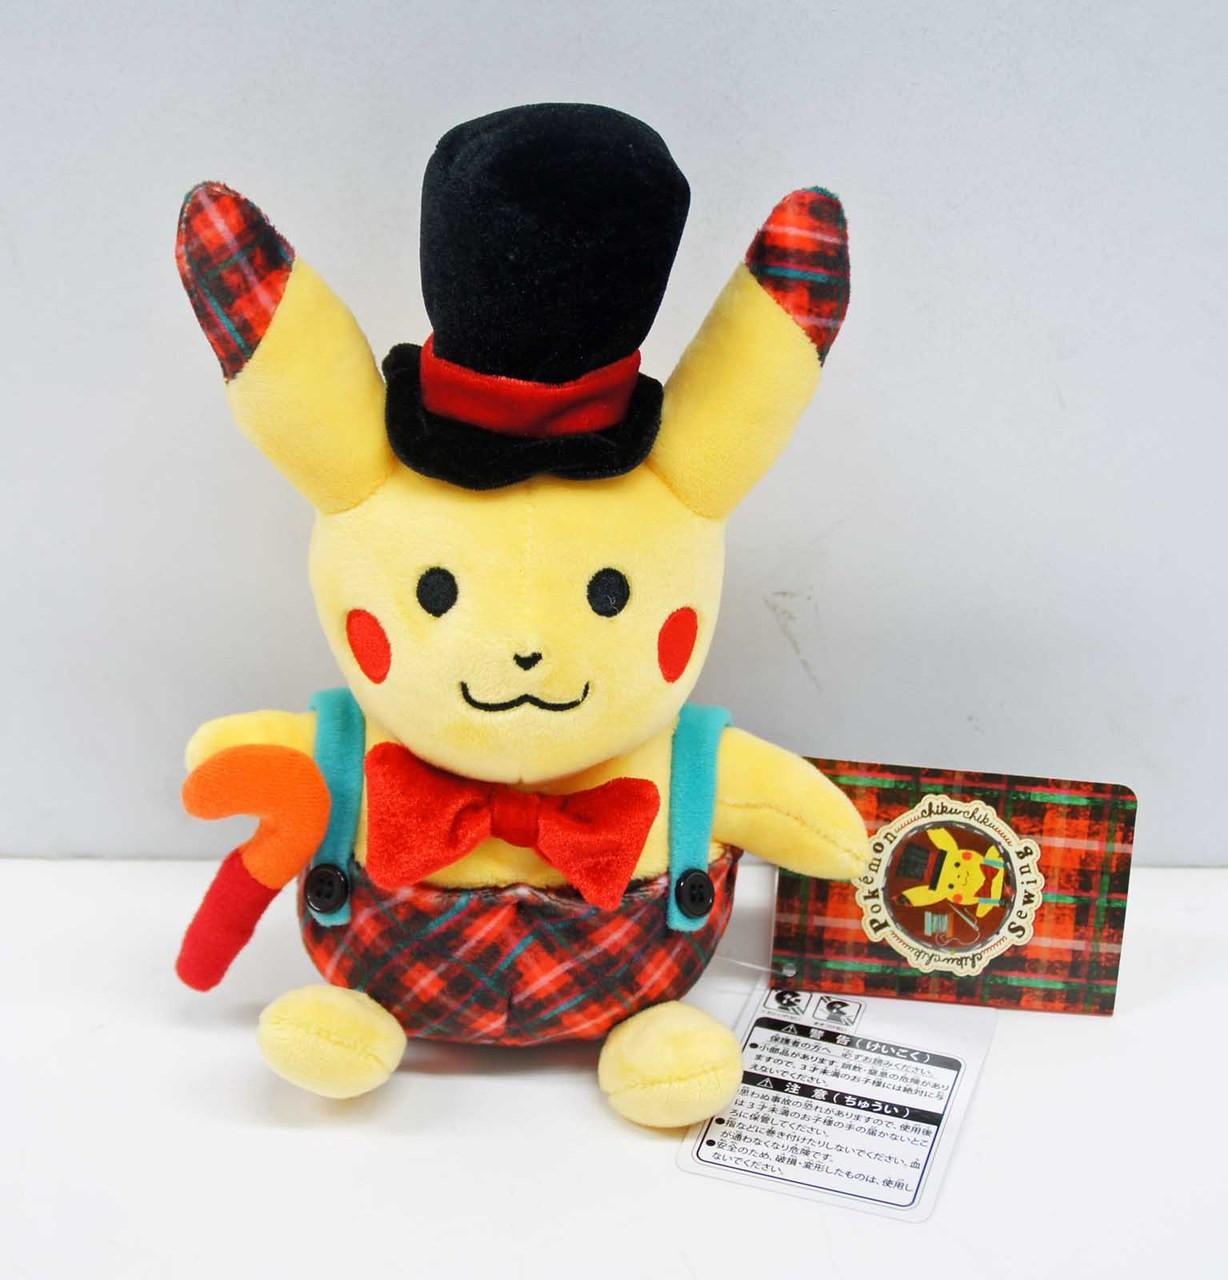 Pokemon Center Original Square cushion pok/émon chiku-chiku sewing Pokémon